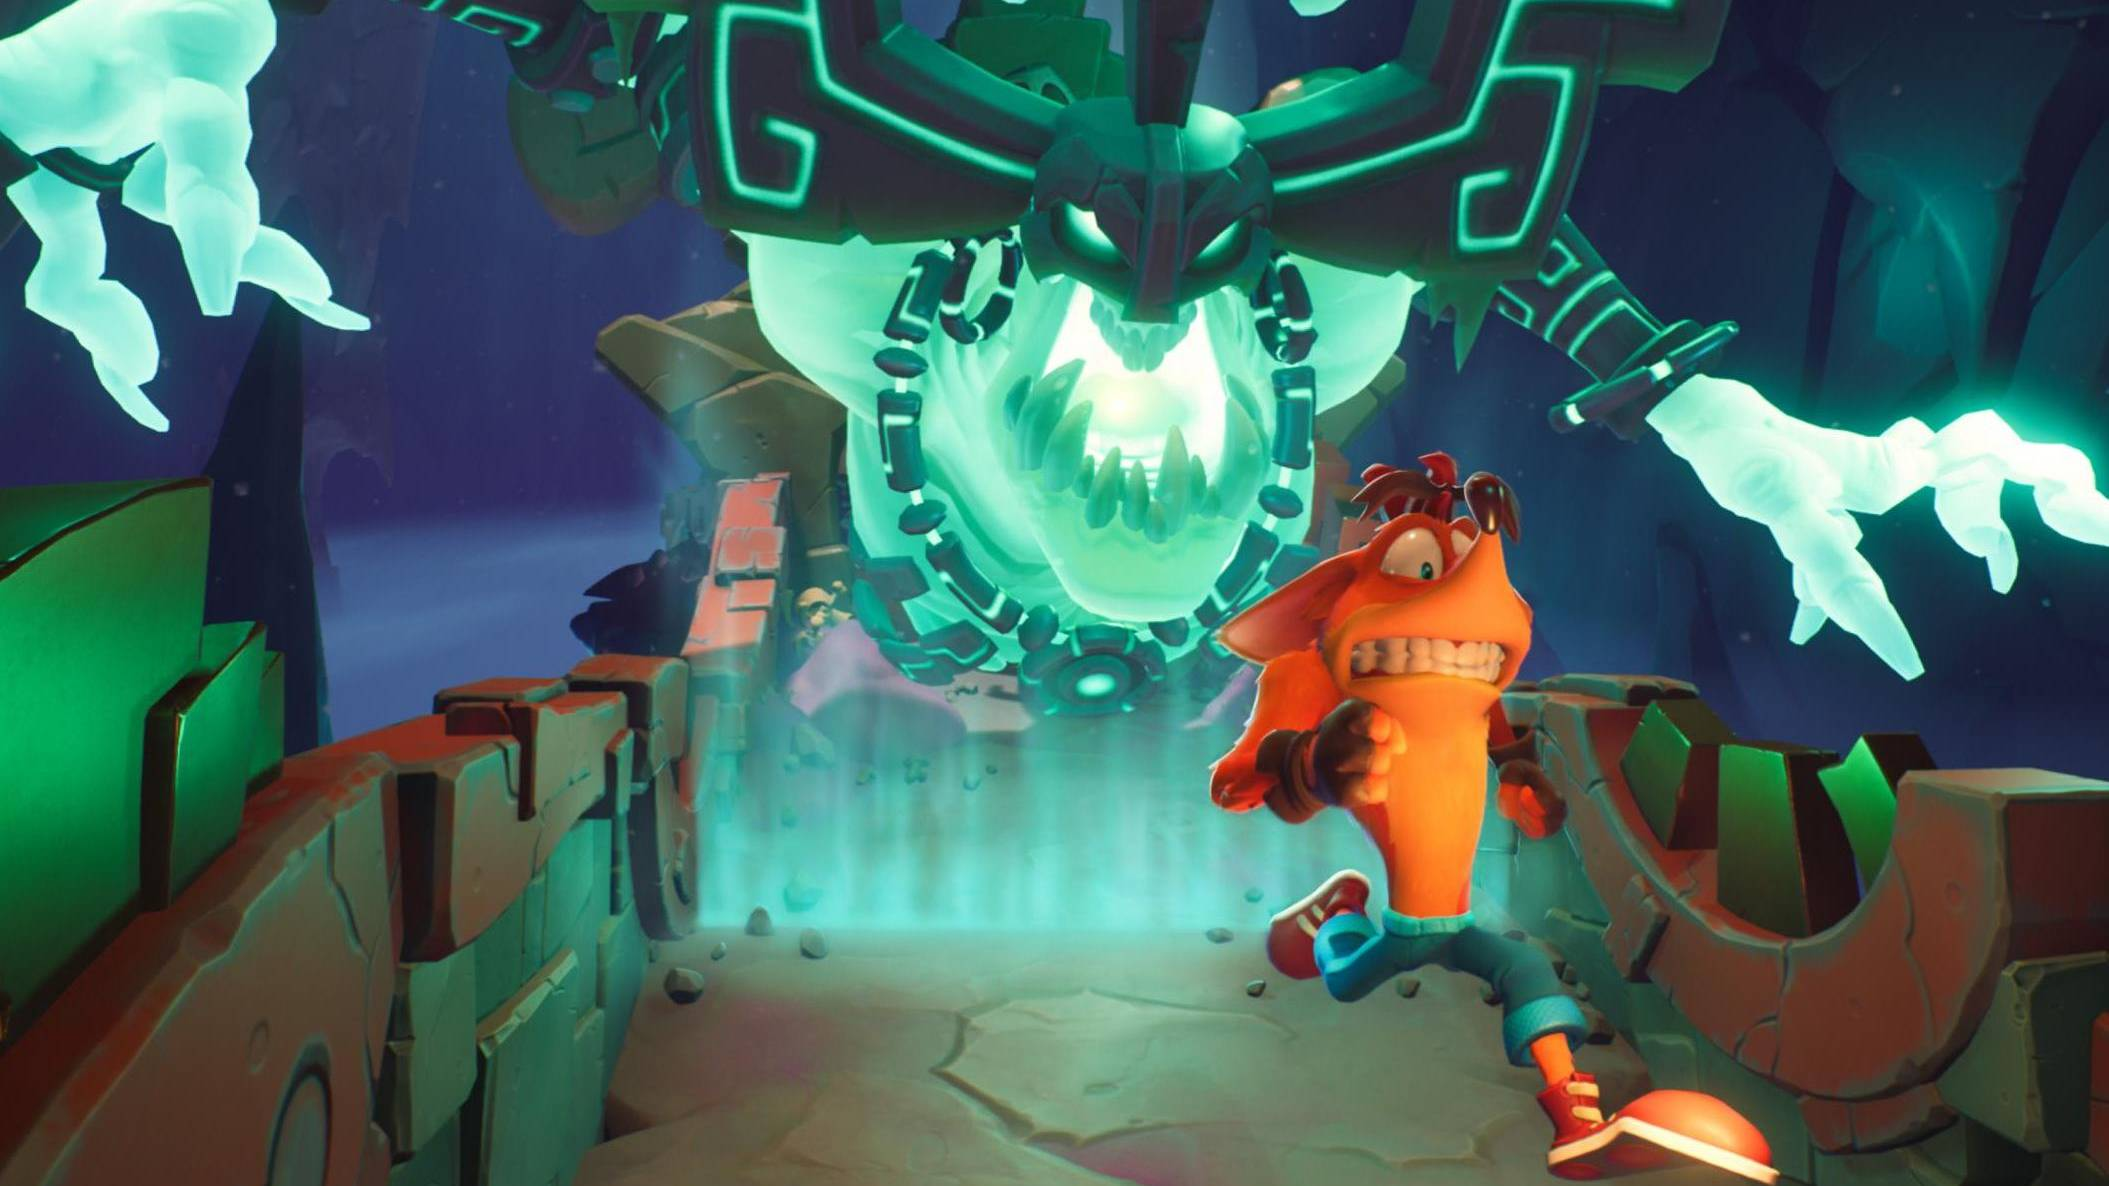 Crash Bandicoot 4 run level